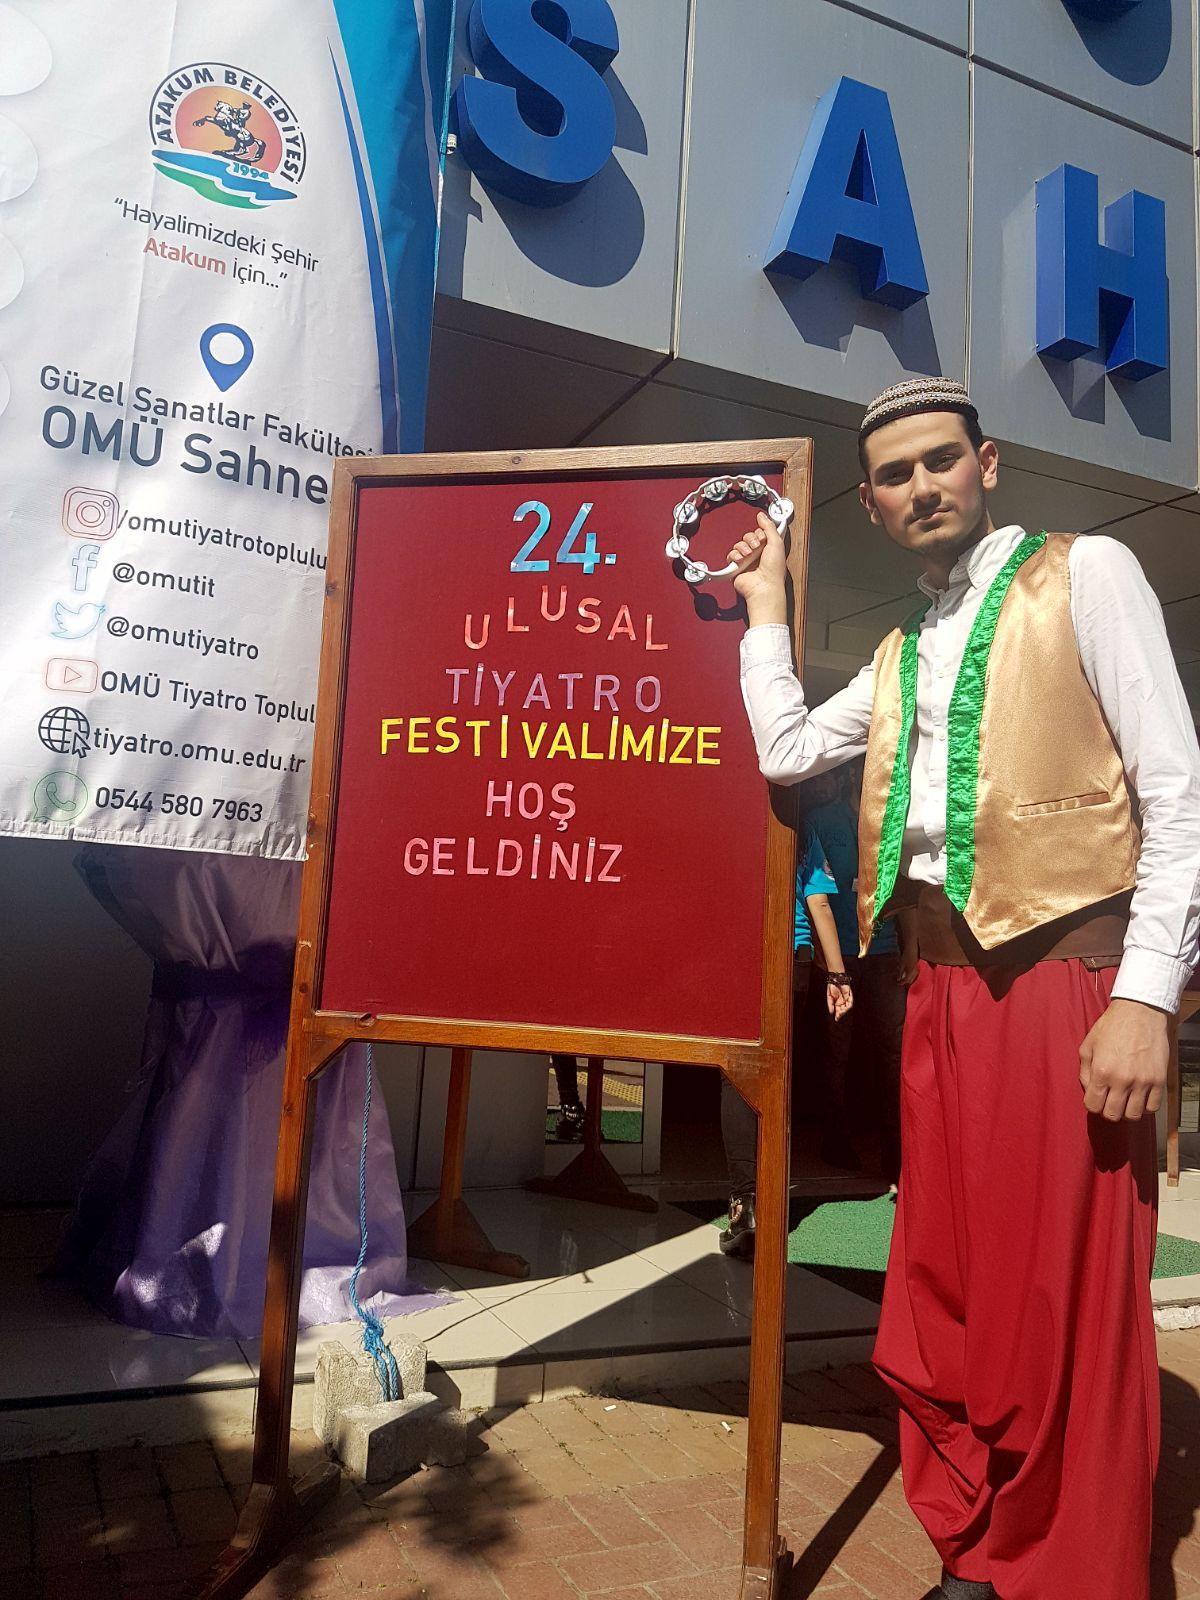 http://www.omu.edu.tr/sites/default/files/files/omu_24._ulusal_tiyatro_festivali_basladi/whatsapp_image_2018-04-15_at_17.35.07.jpeg